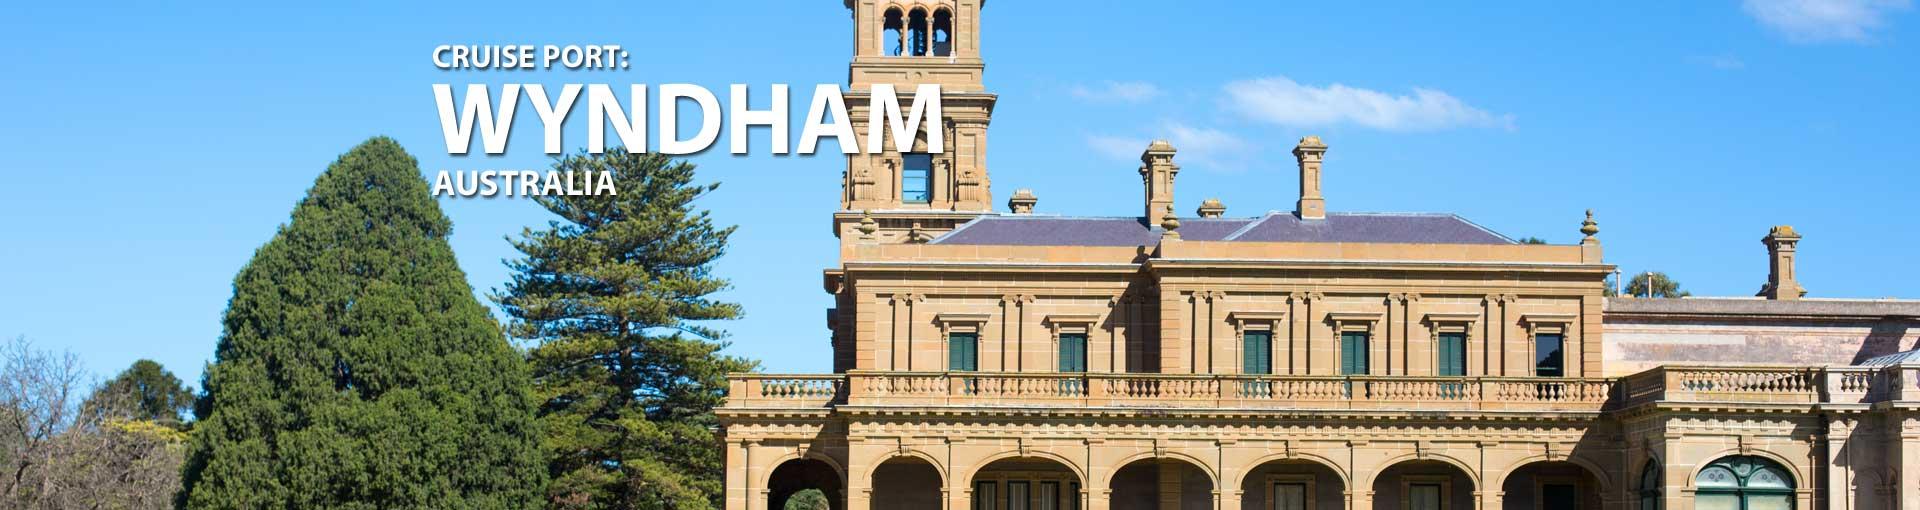 Cruises to Wyndham, Australia